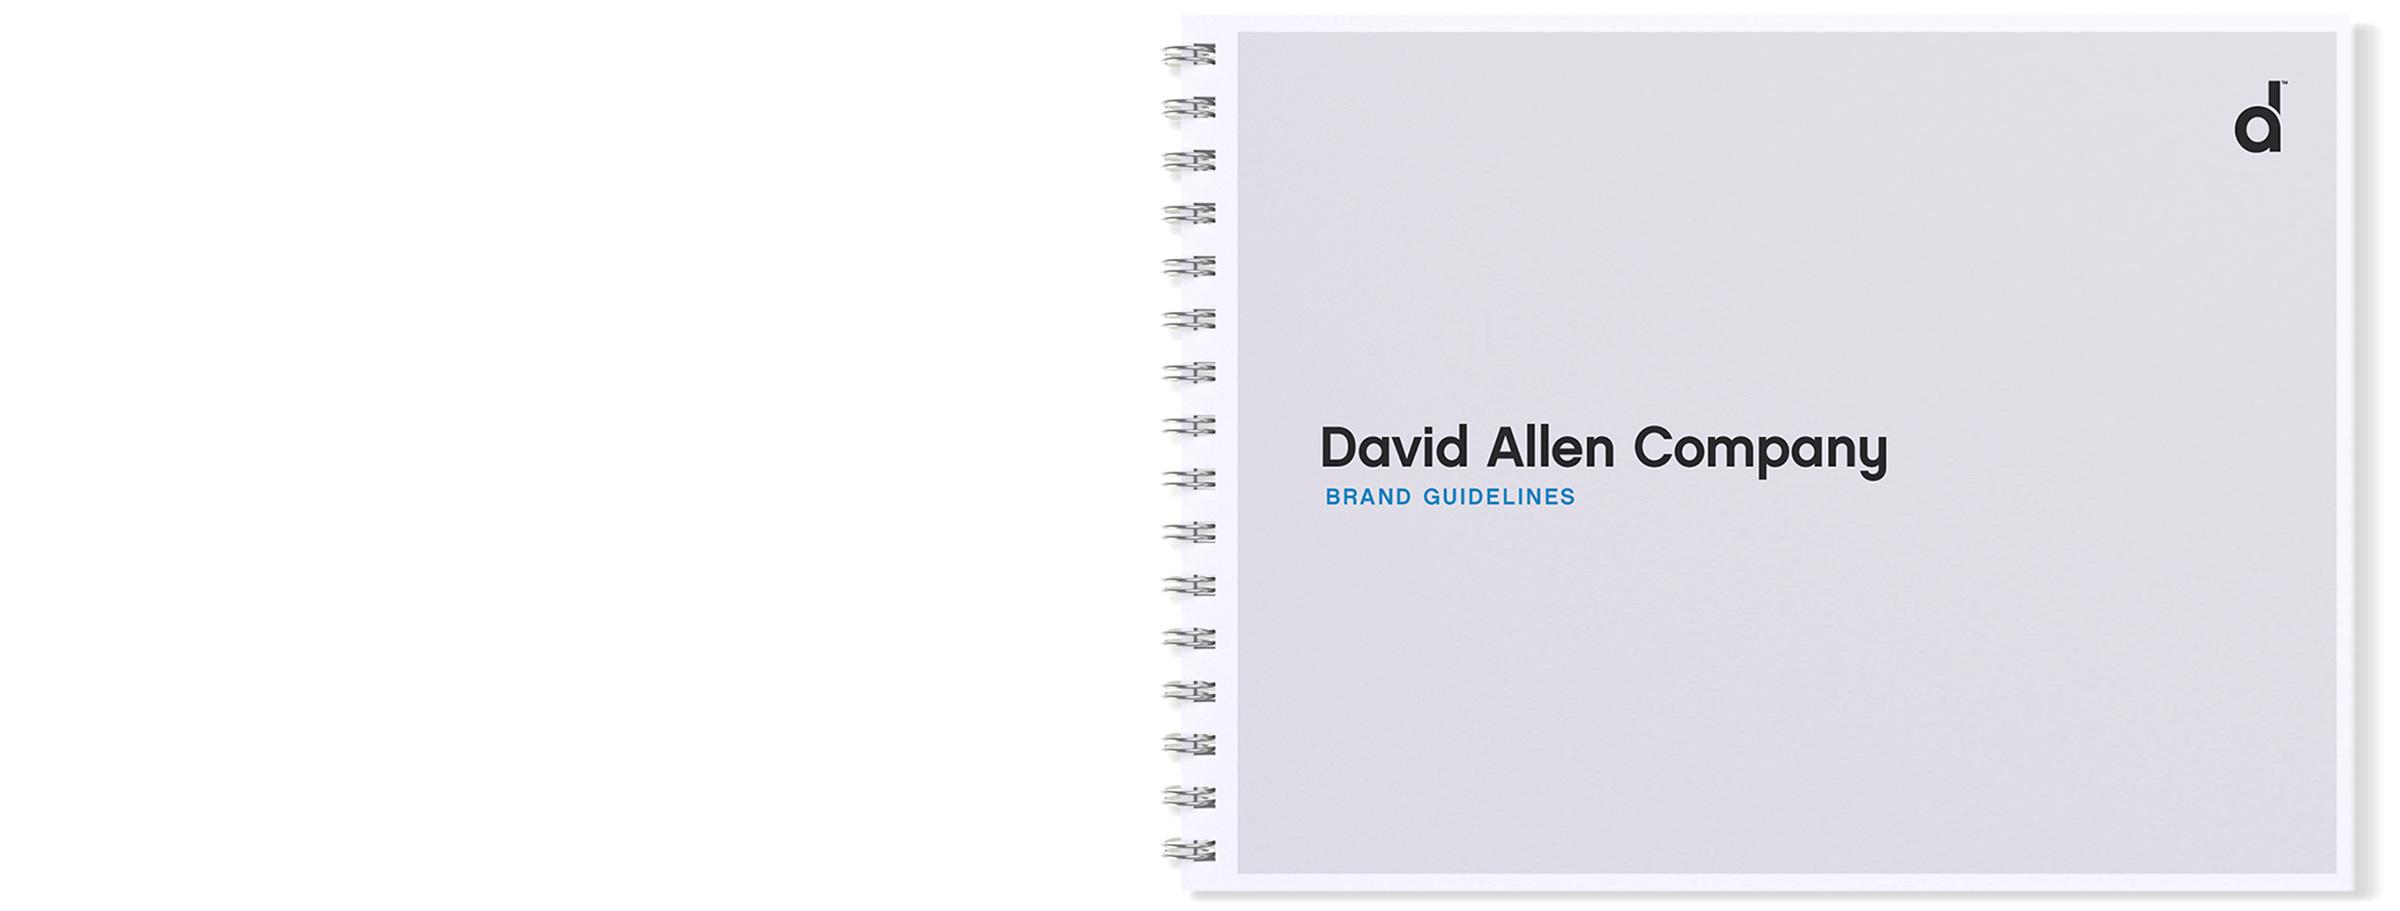 DAC-Brand-Guidelines_1.jpg